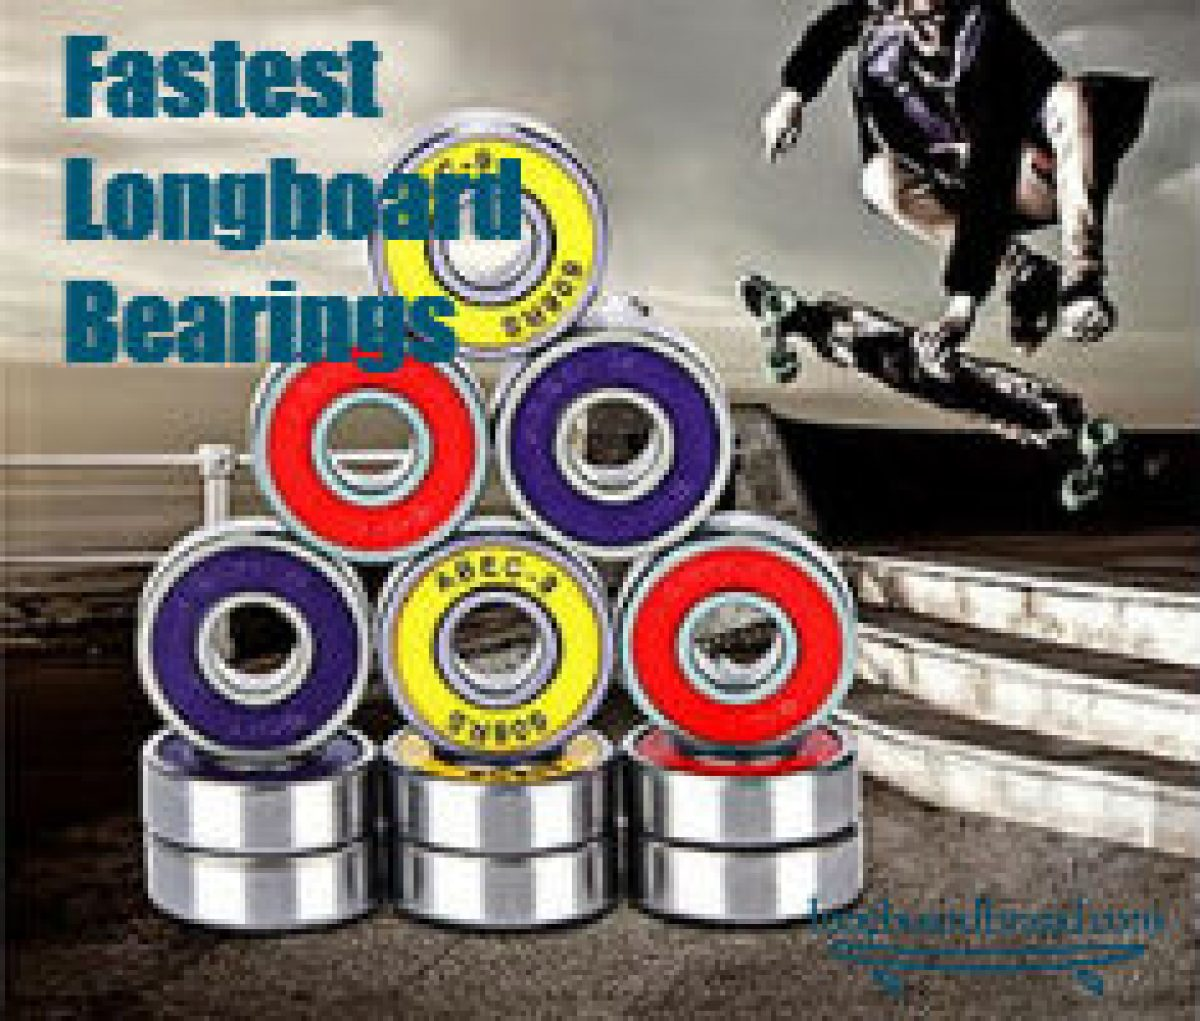 8 Skateboard Longboard Bearings PRECISION ABEC 9 RED SHIELD